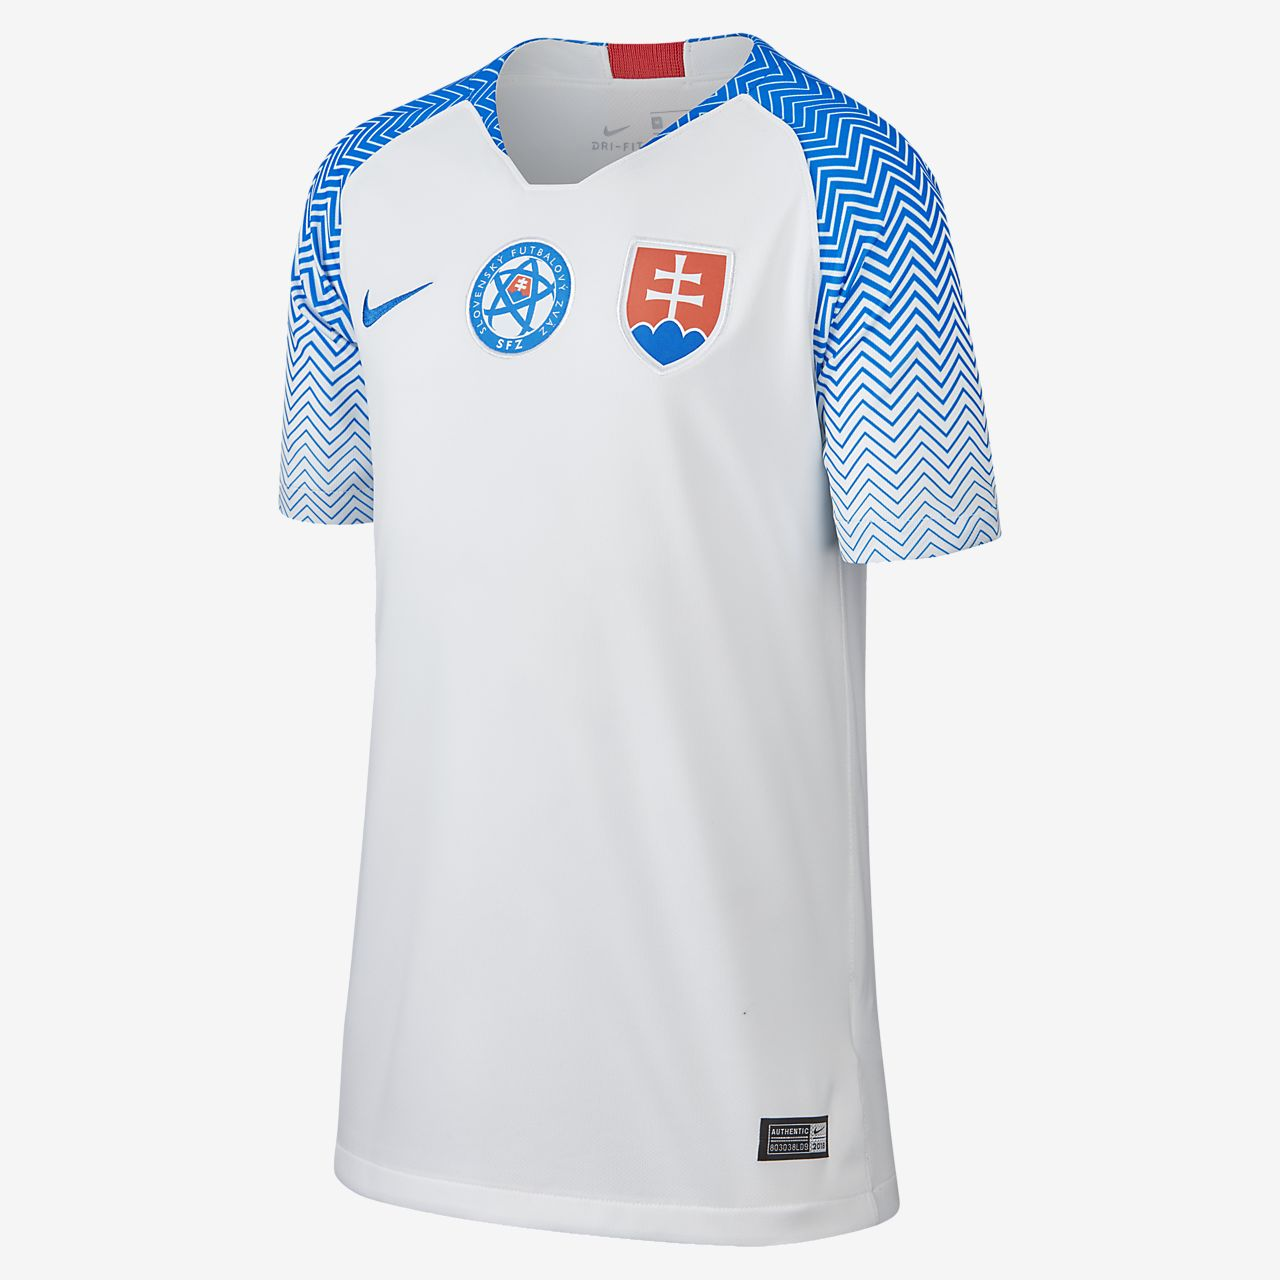 2018 Slovakia Stadium Home Voetbalshirt voor kids